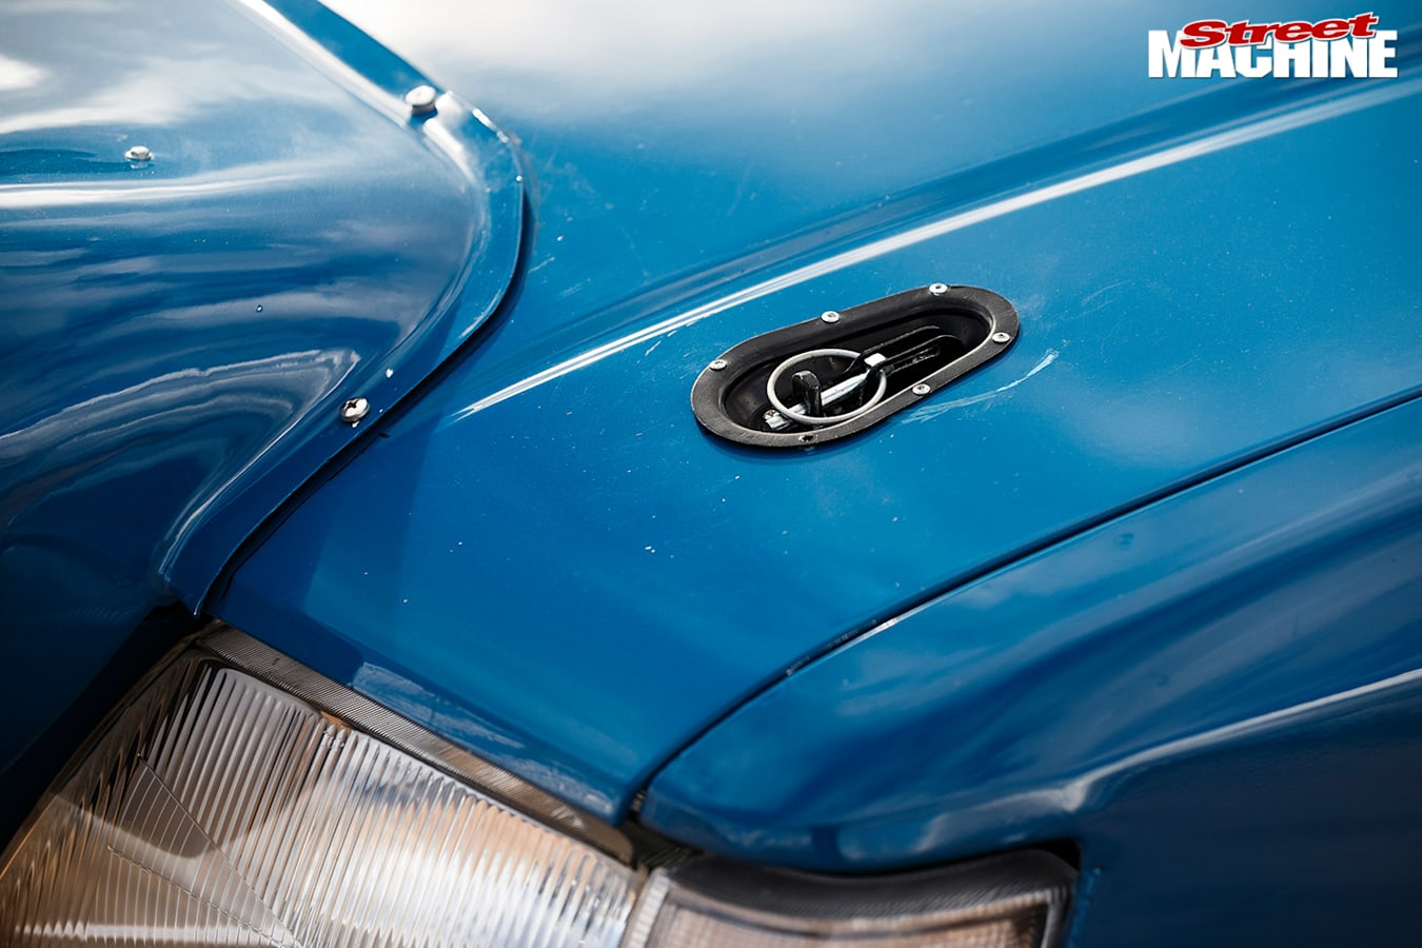 Holden VK Commodore rally car bonnet